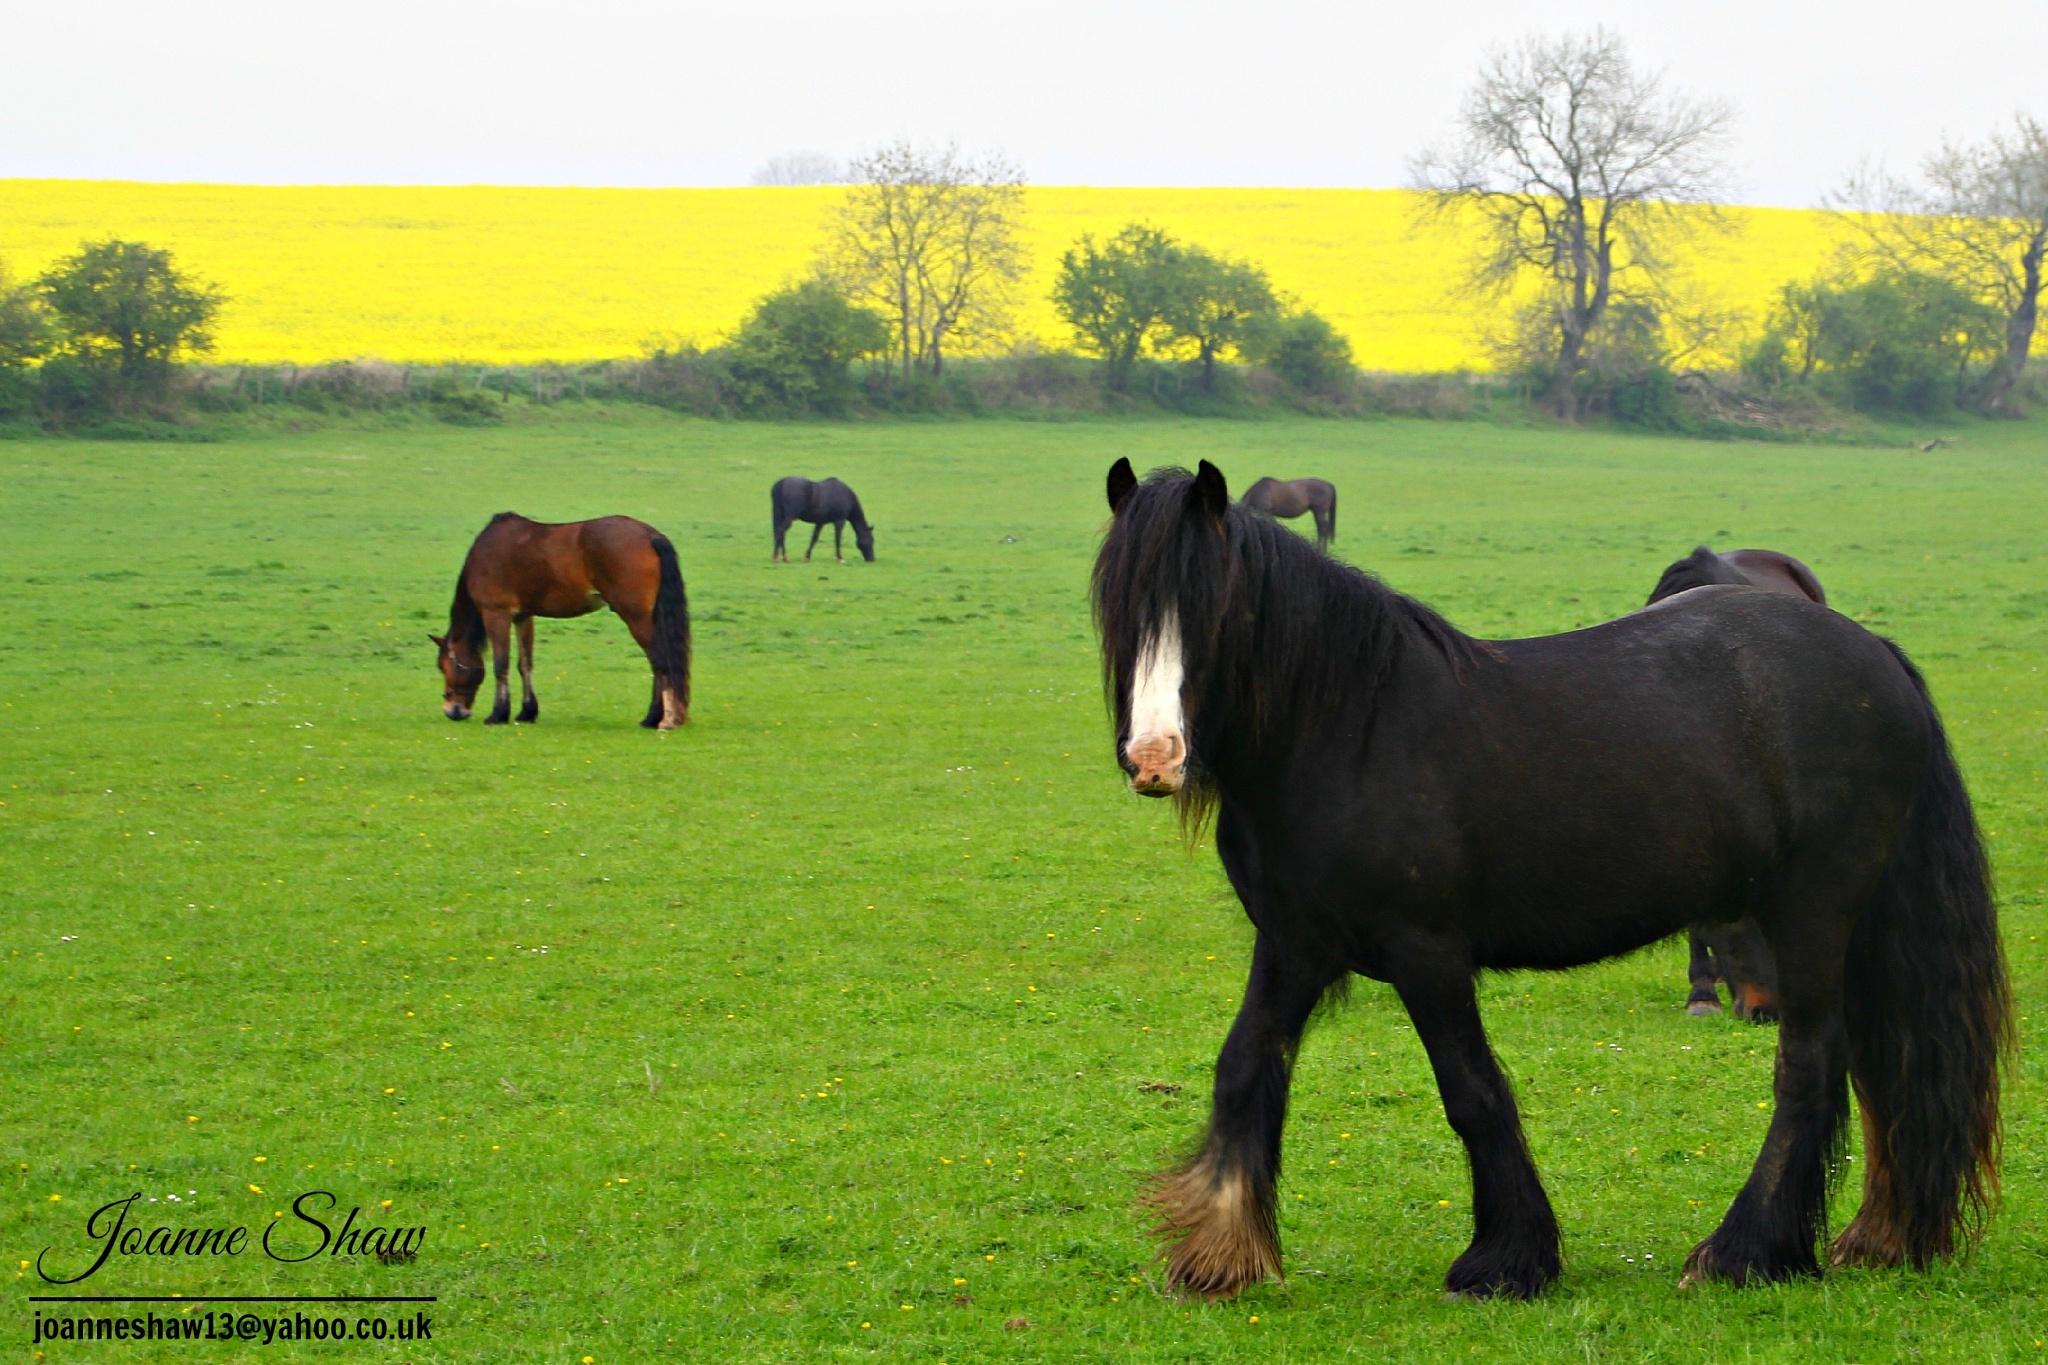 Horses in a field by Joanne Laws